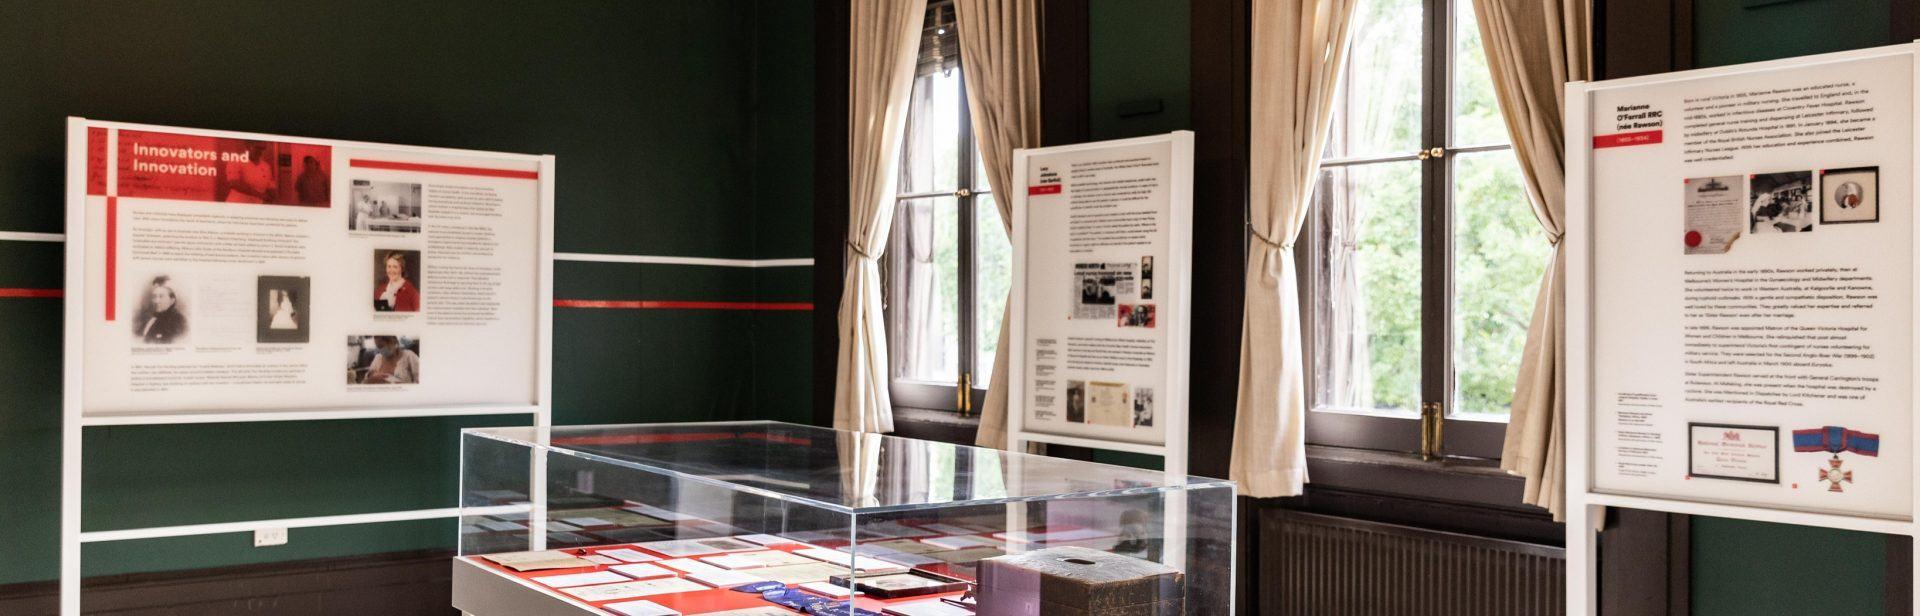 Unmasked exhibition